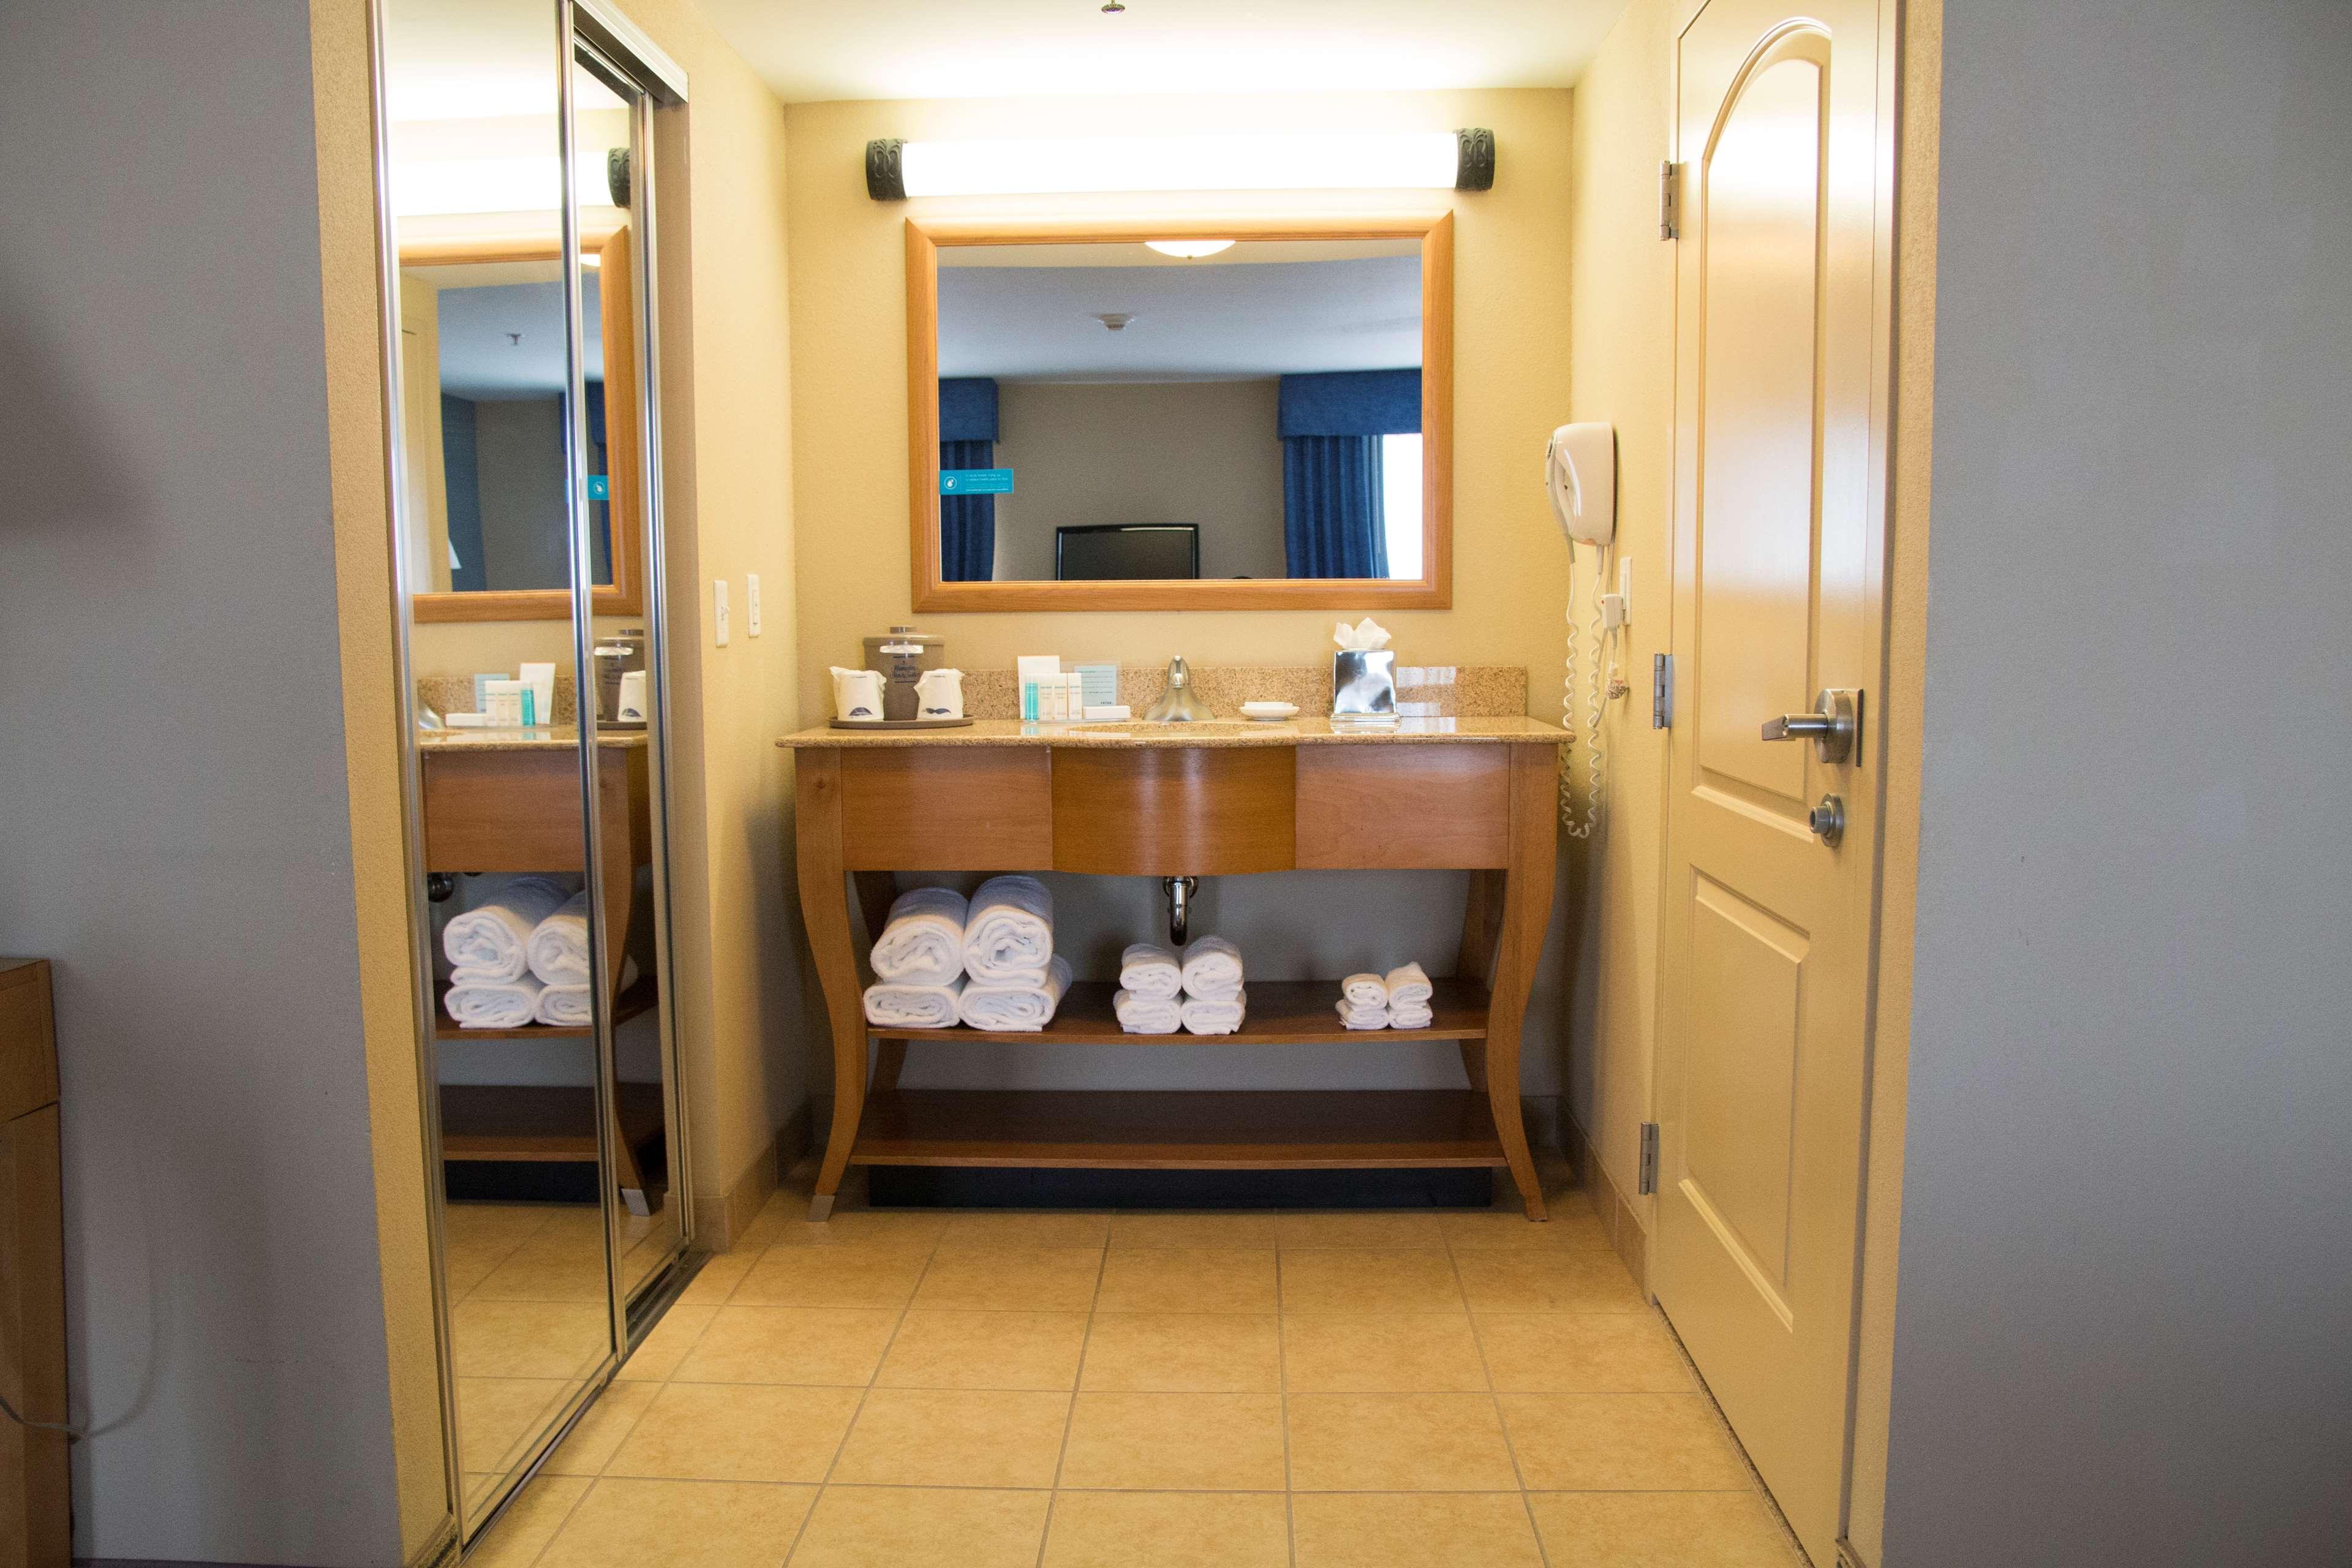 Hampton Inn & Suites Madera image 29